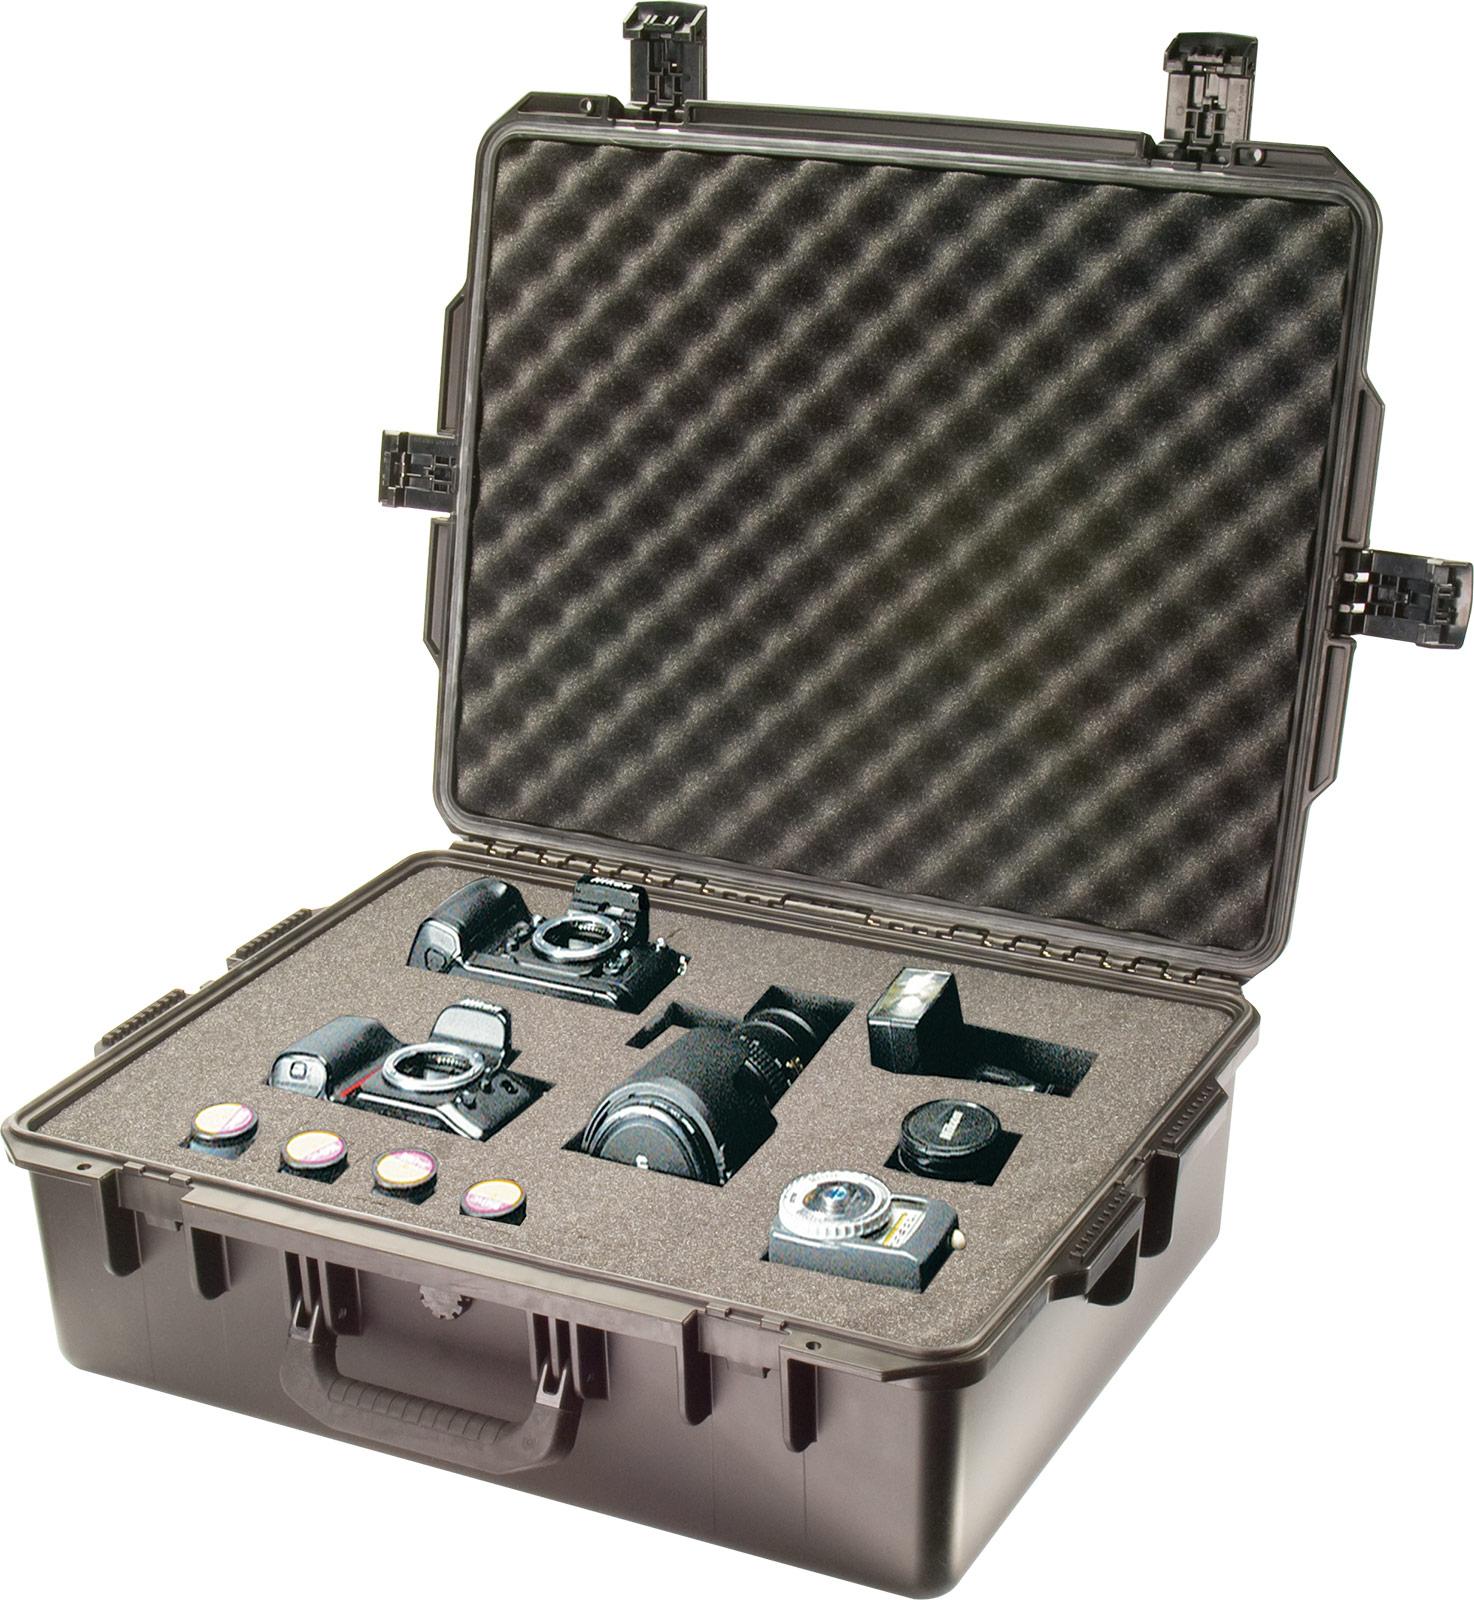 pelican im2700 storm large dslr camera case